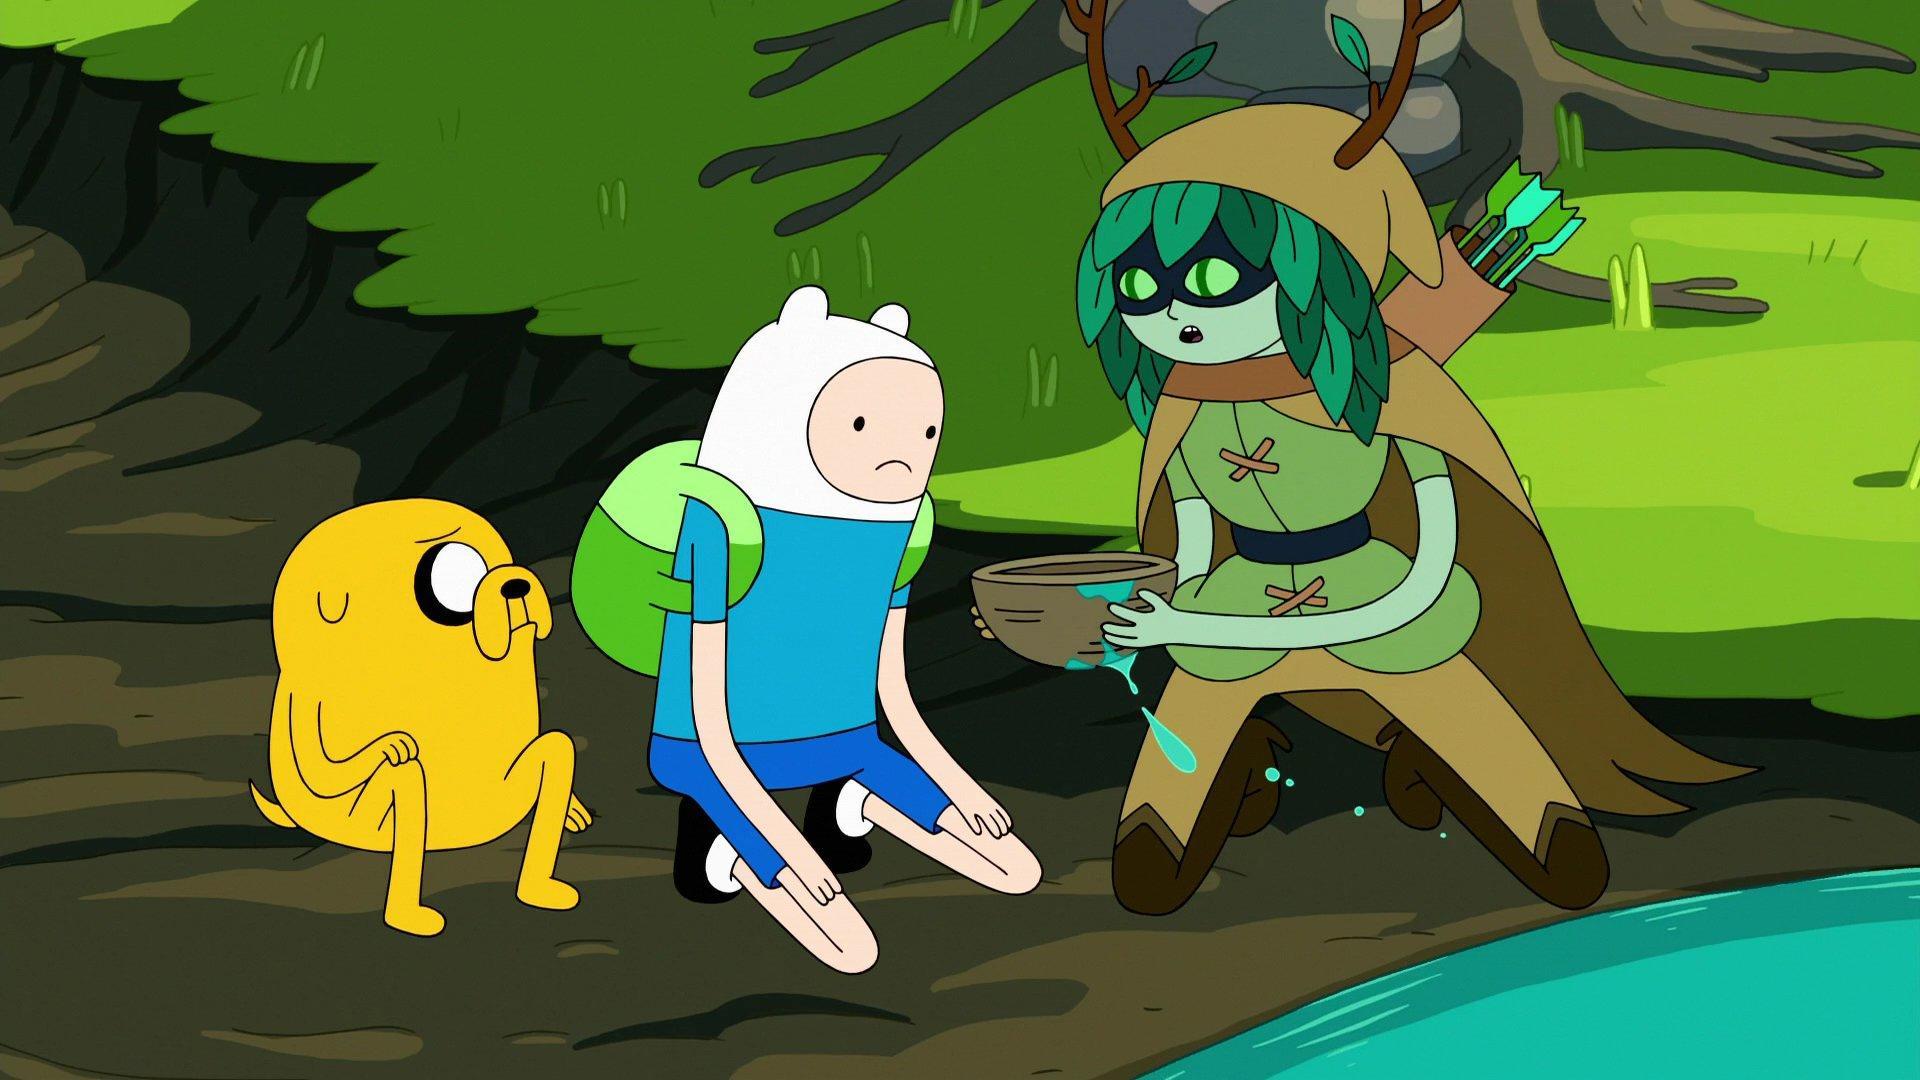 Adventure time season 5 episode 28 full episode - Sigcse 2016 poster